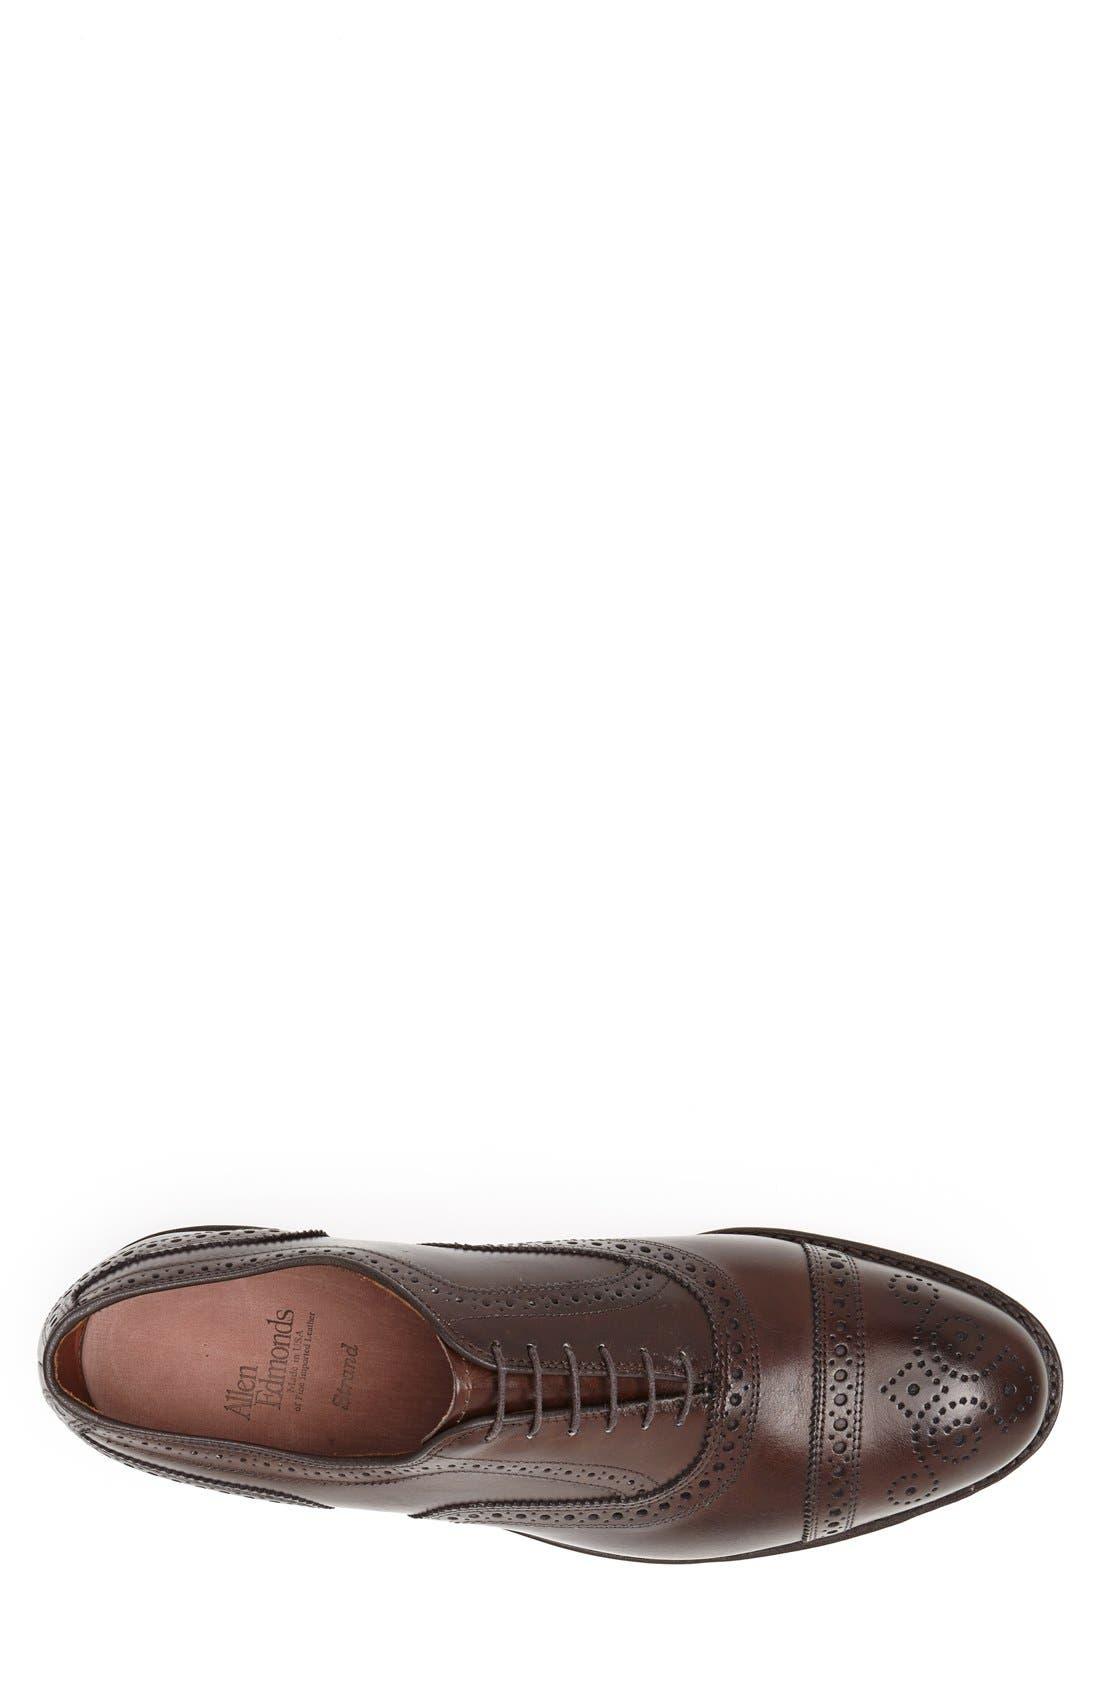 ALLEN EDMONDS, 'Strand' Cap Toe Oxford, Alternate thumbnail 4, color, BROWN BURNISHED CALF